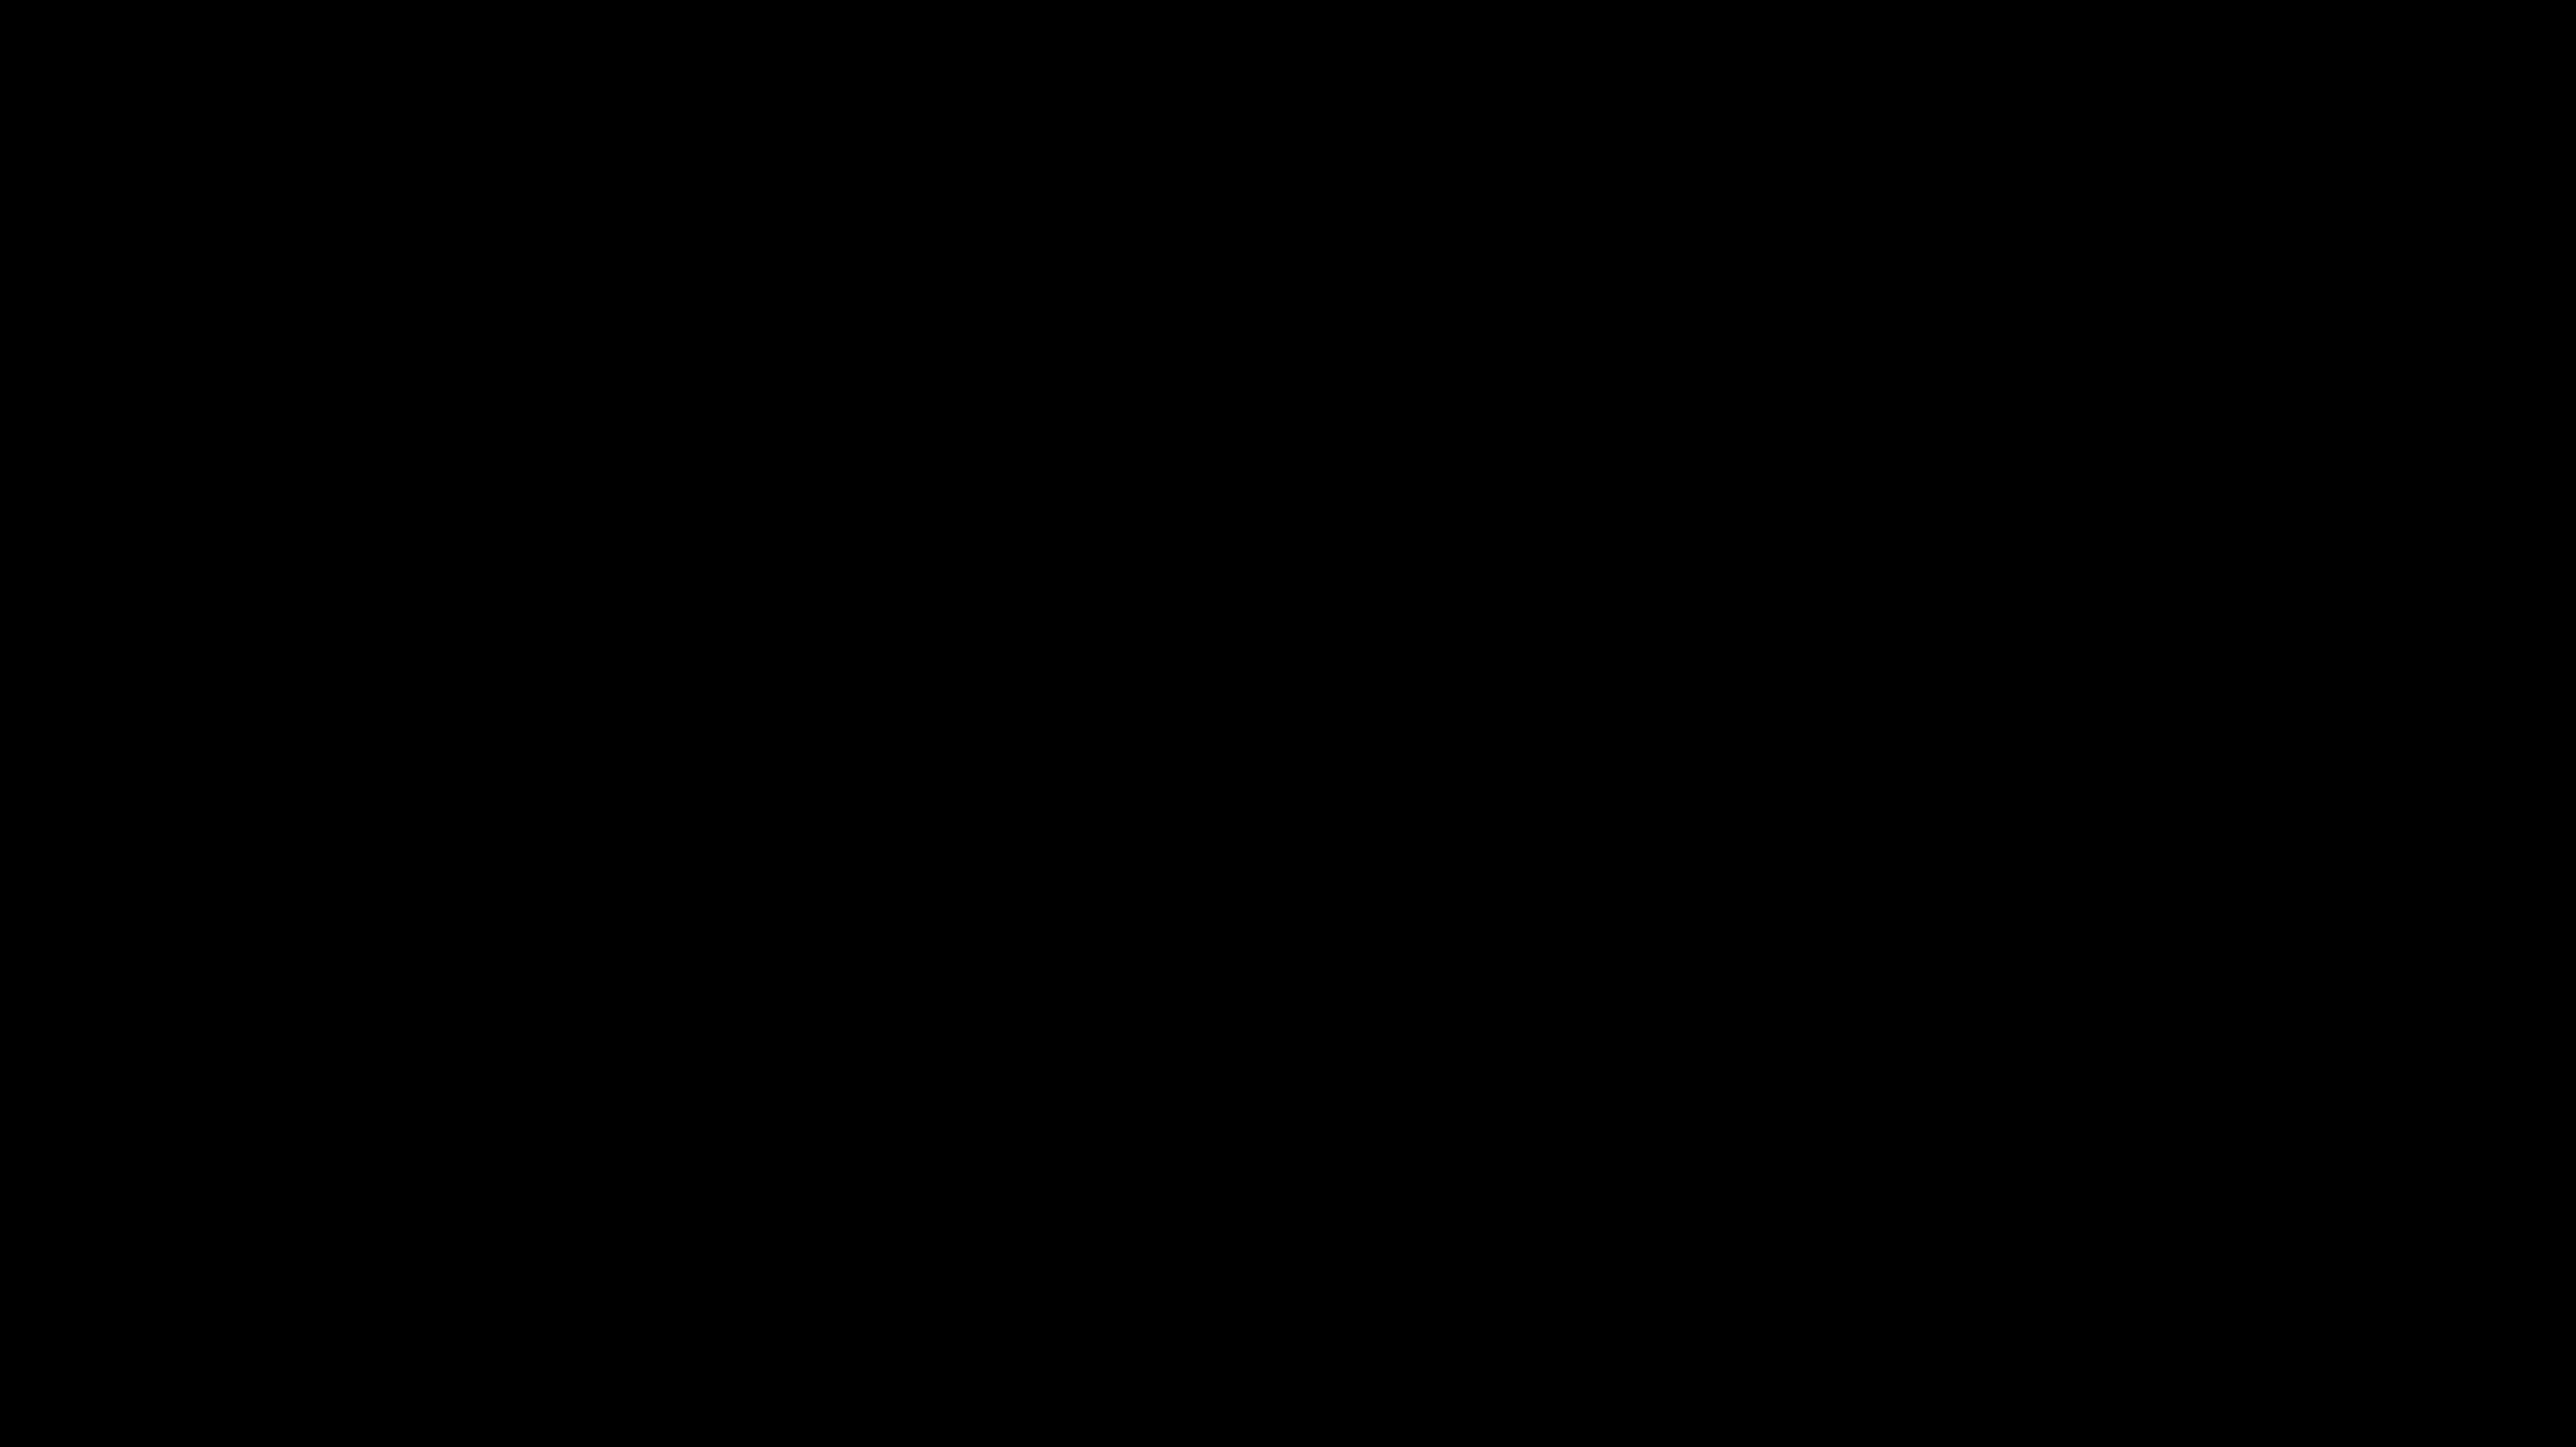 img_6245